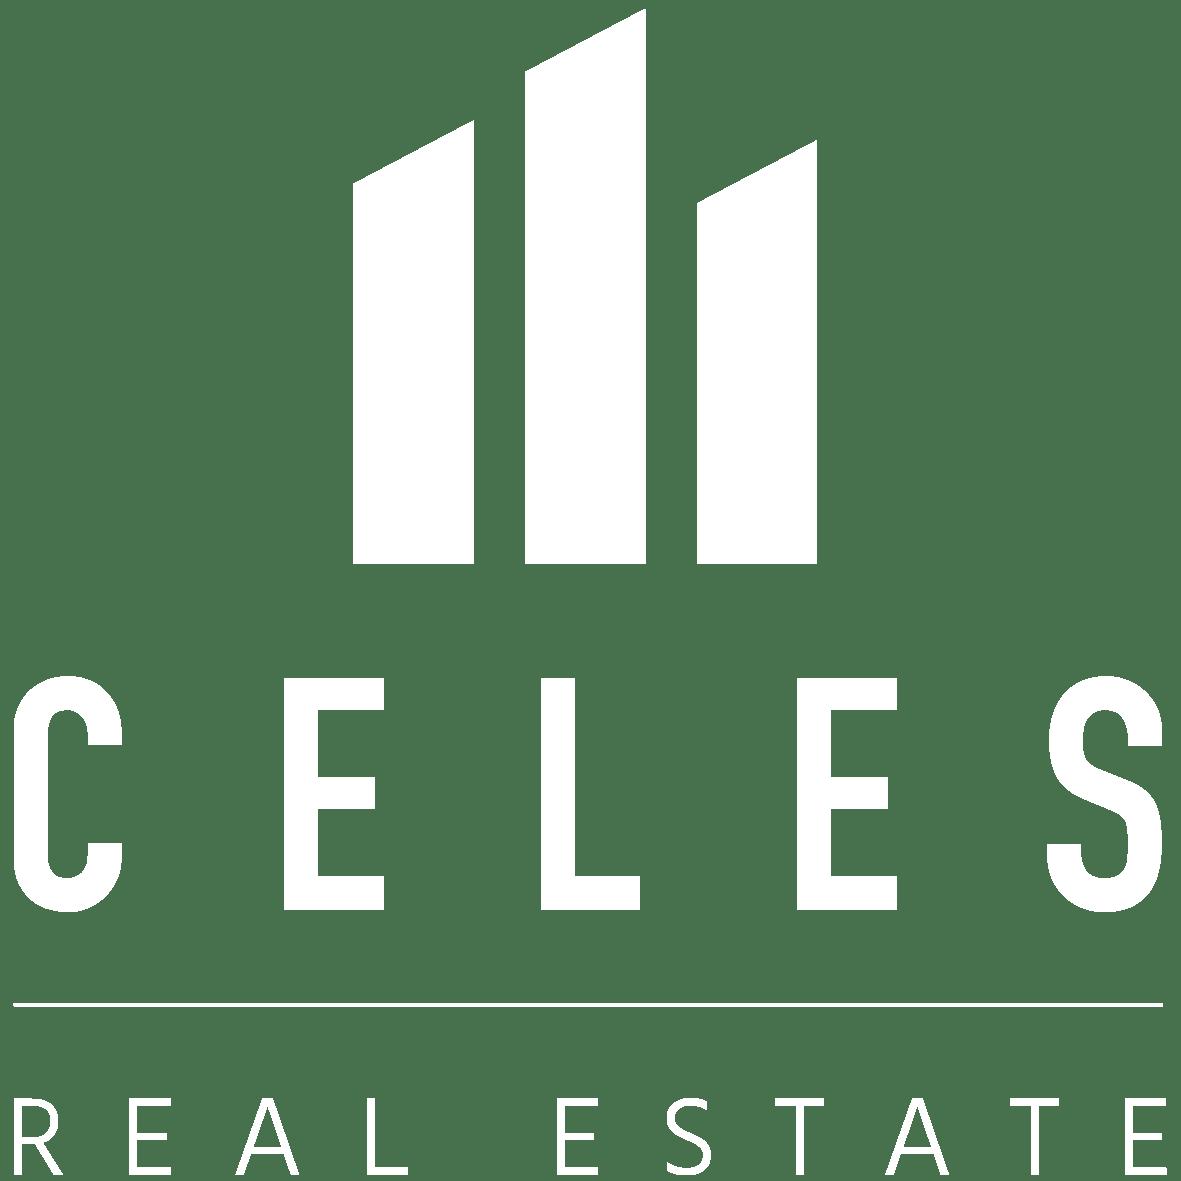 Celes | Real Estate